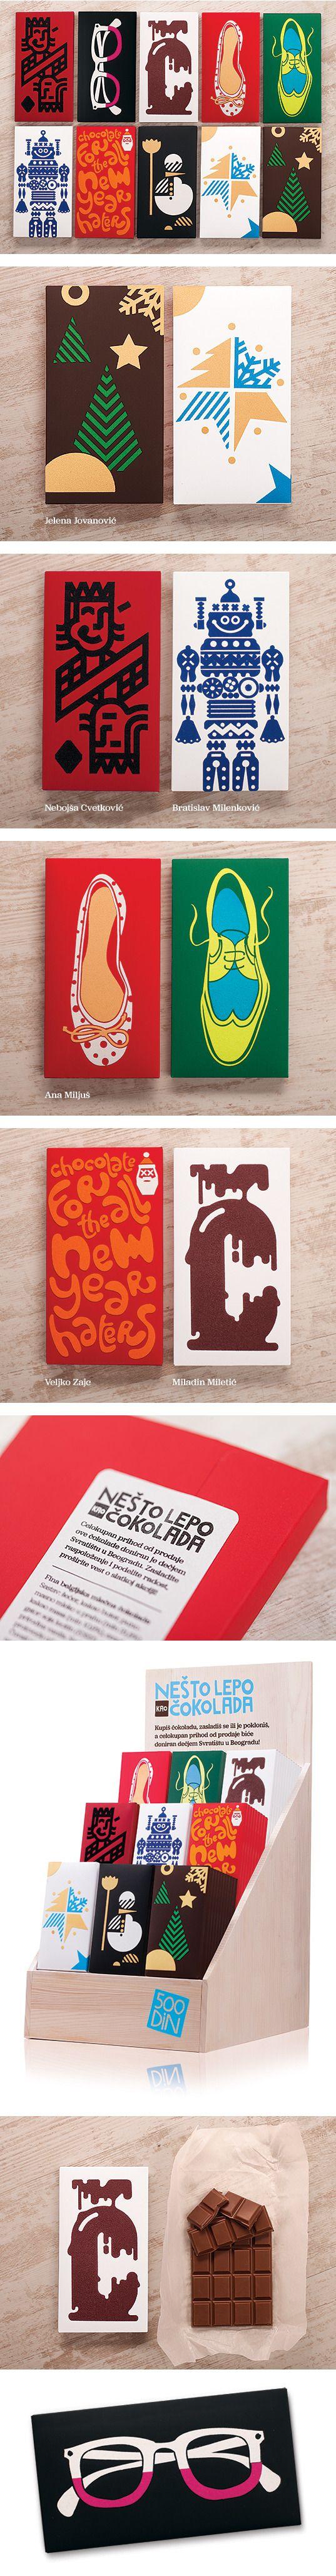 Sillas vintage el rinc 243 n di ree - Ne To Lepo Kao Okolada Chocolate Packaging By Veljko Zajc